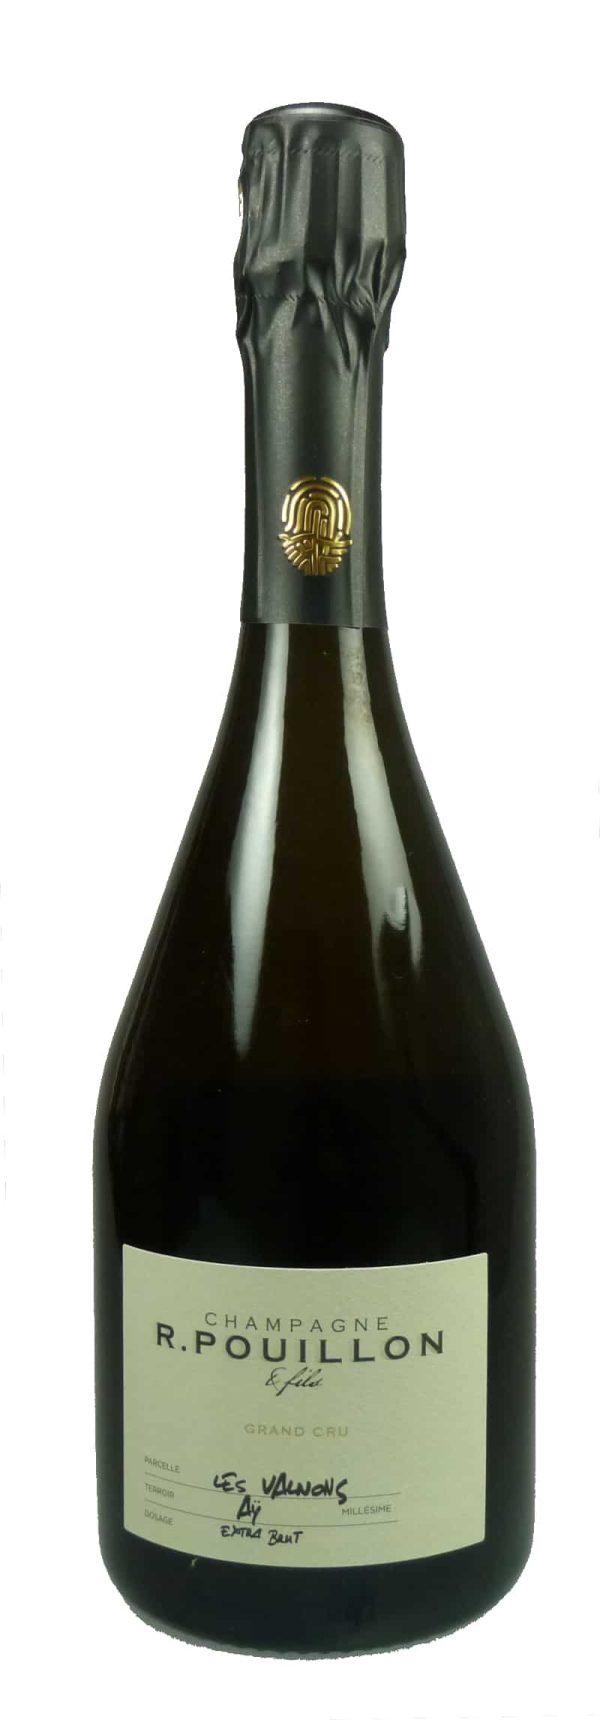 Les Valnons Champagne Extra Brut Grand Cru 2011